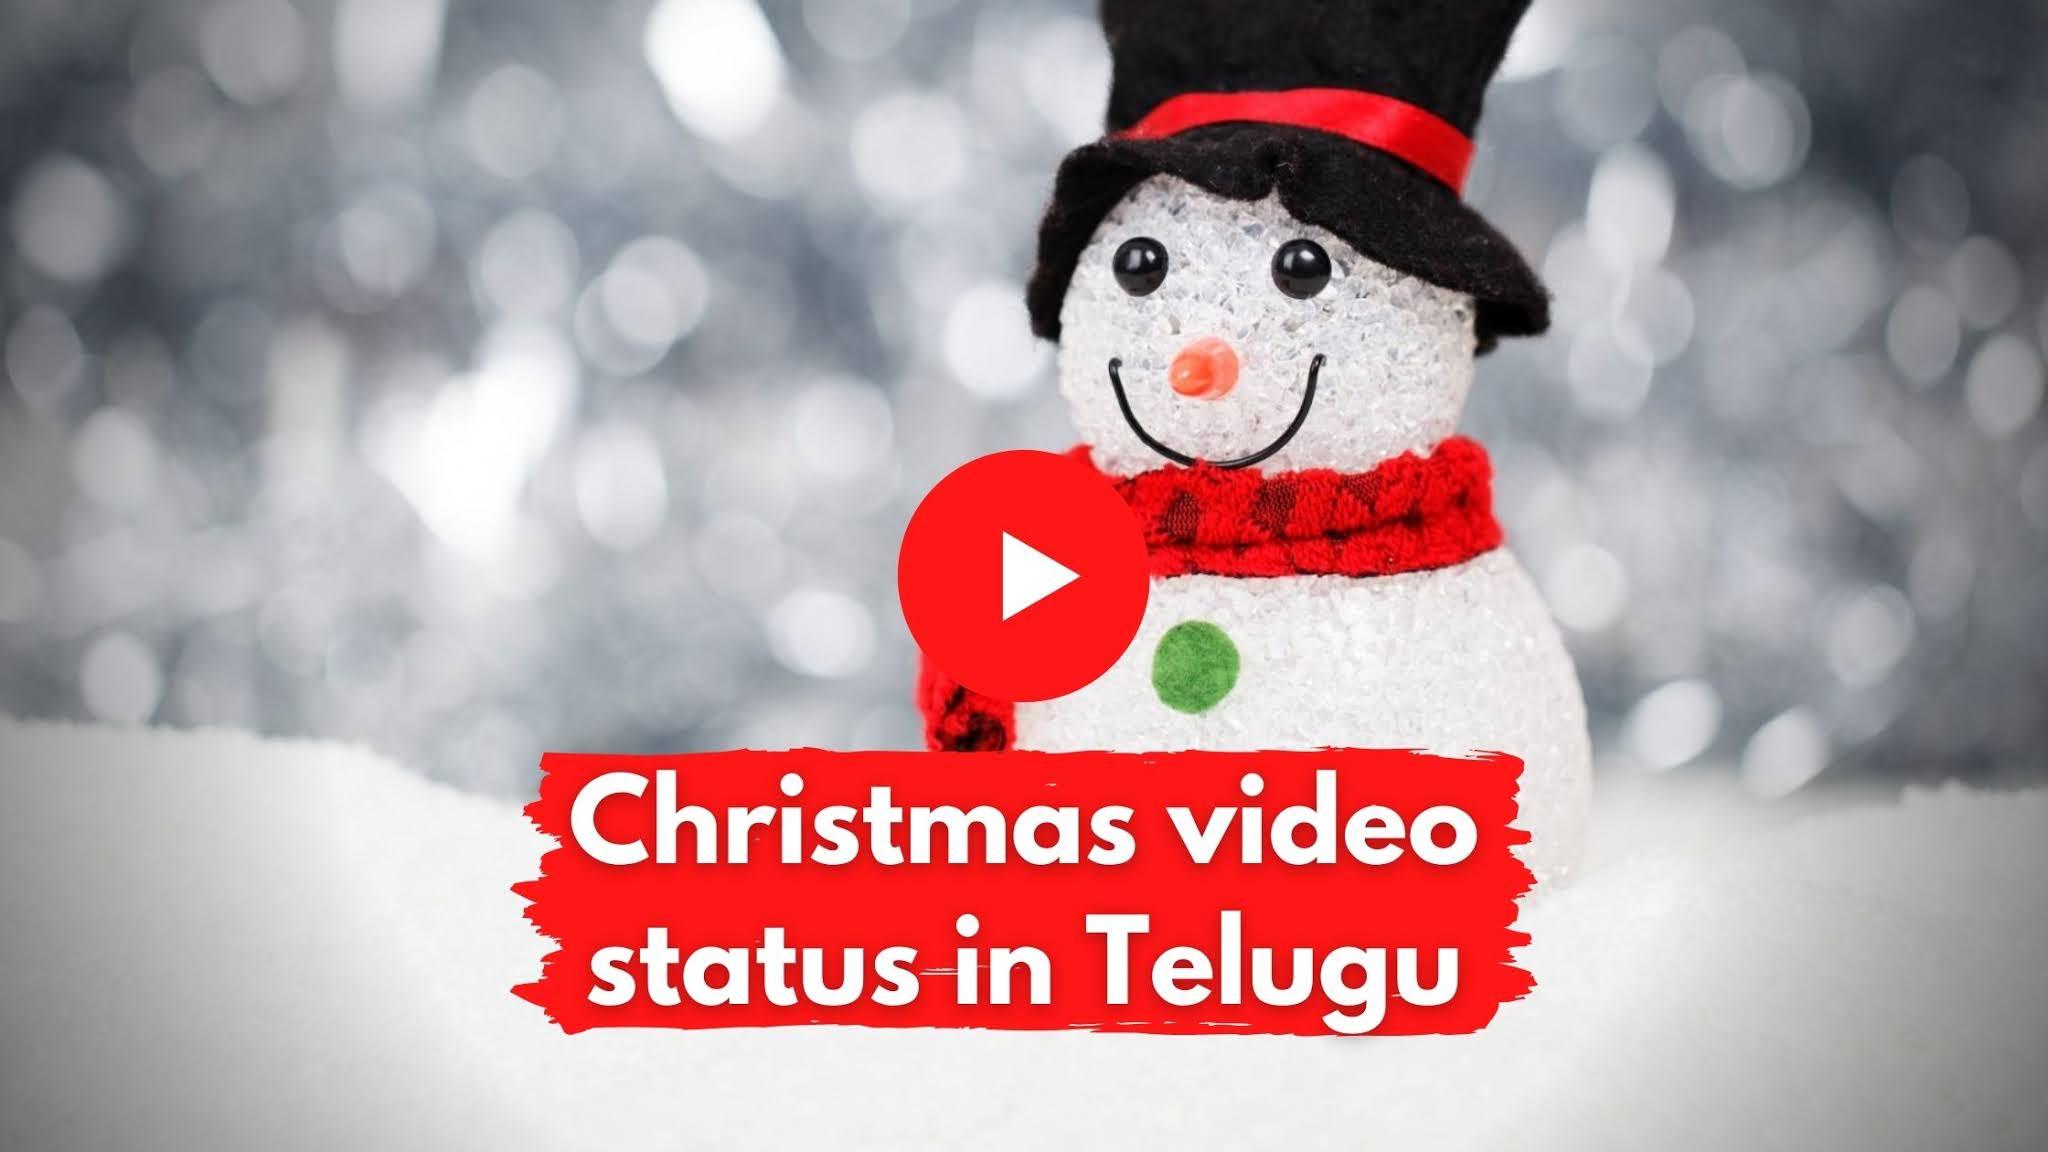 Christmas videos status in Telugu